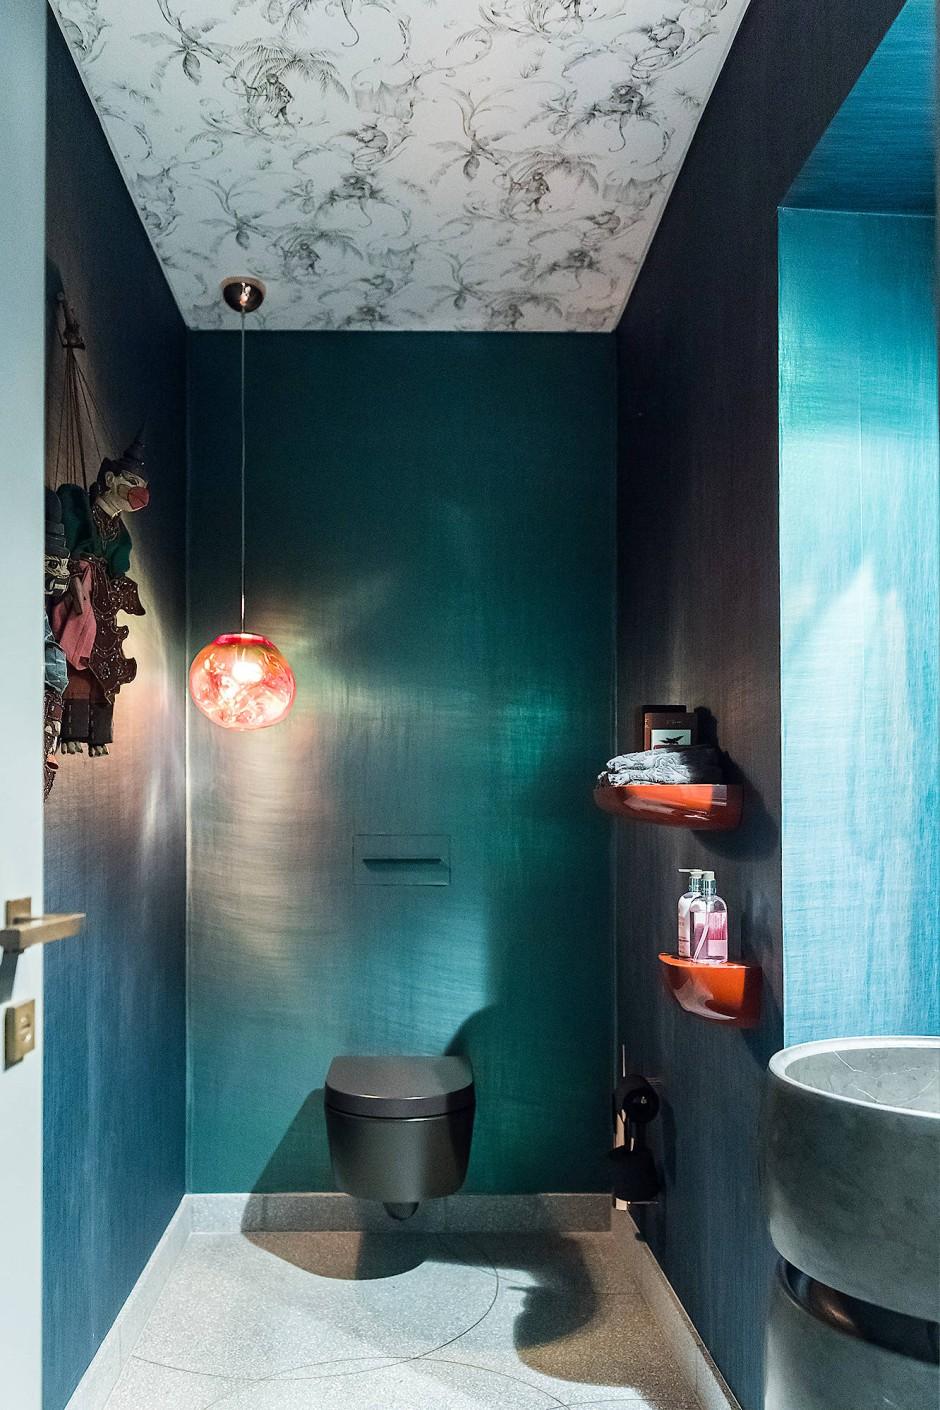 Mit Konzept: Interior Designerin Doortje Moritz gestaltet WCs originell-elegant.